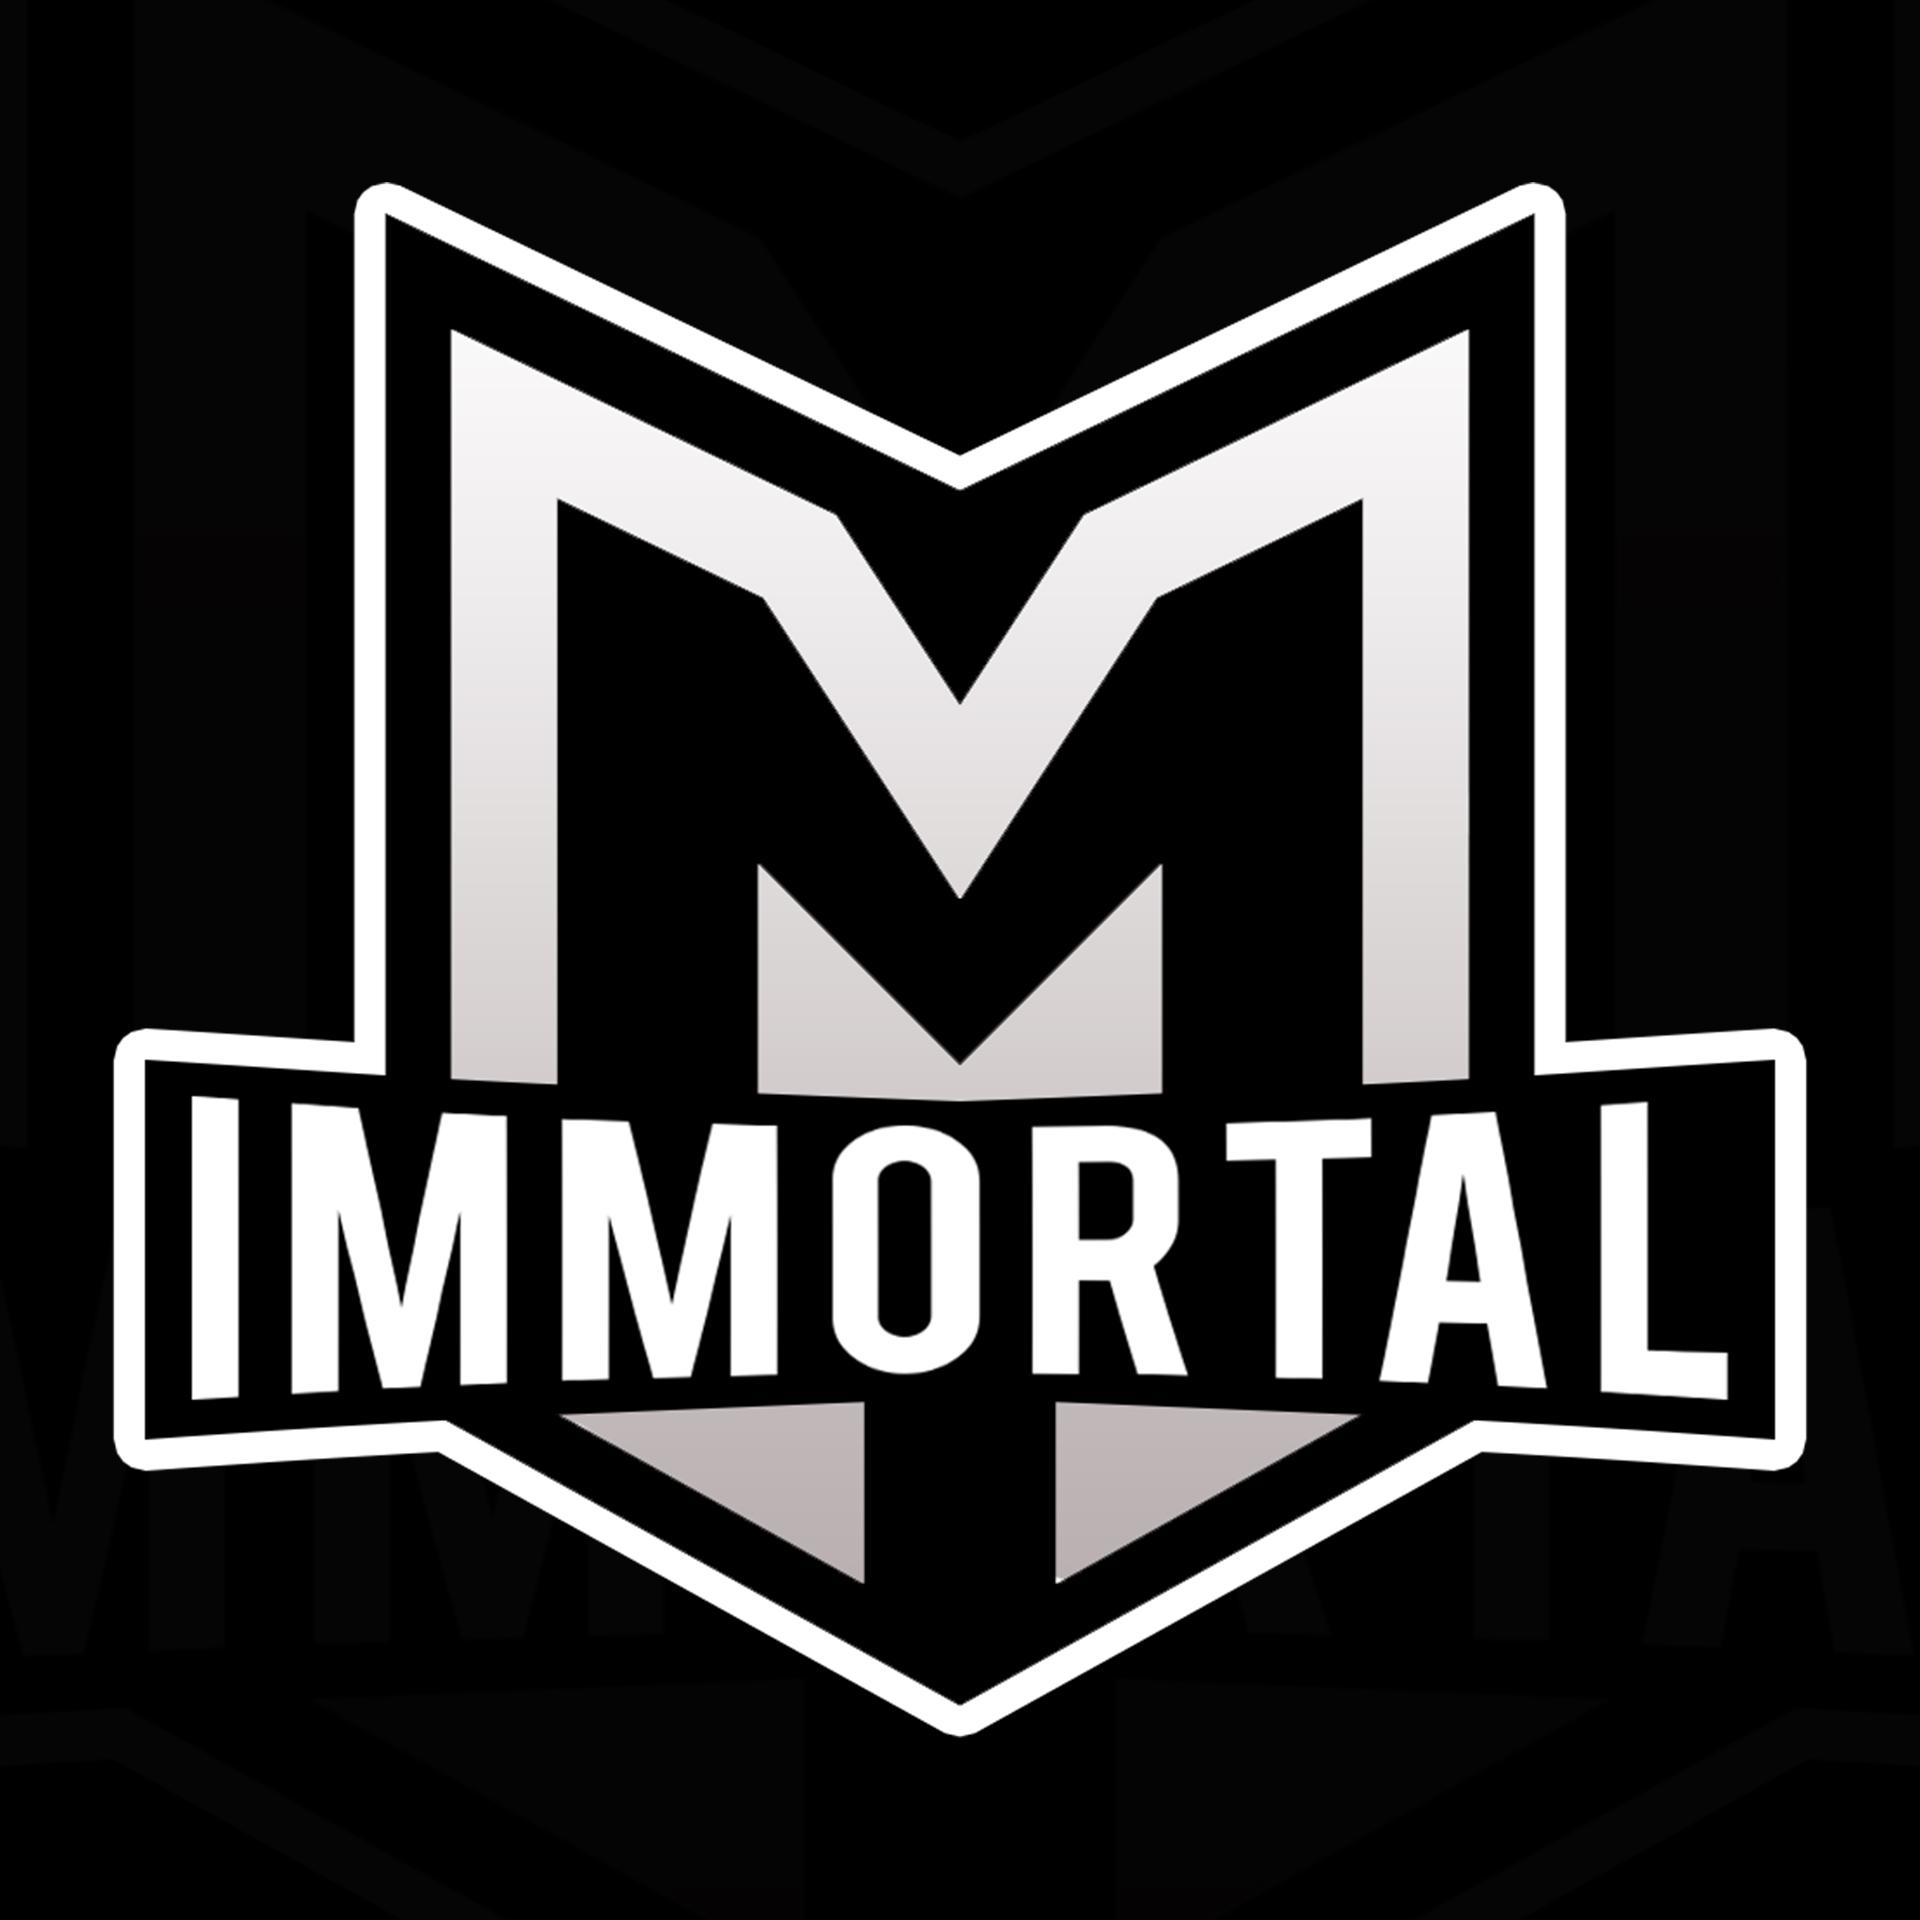 https://rivalesports.com/logos/1487629227-ImmortalEsportsLOGO.jpg логотип